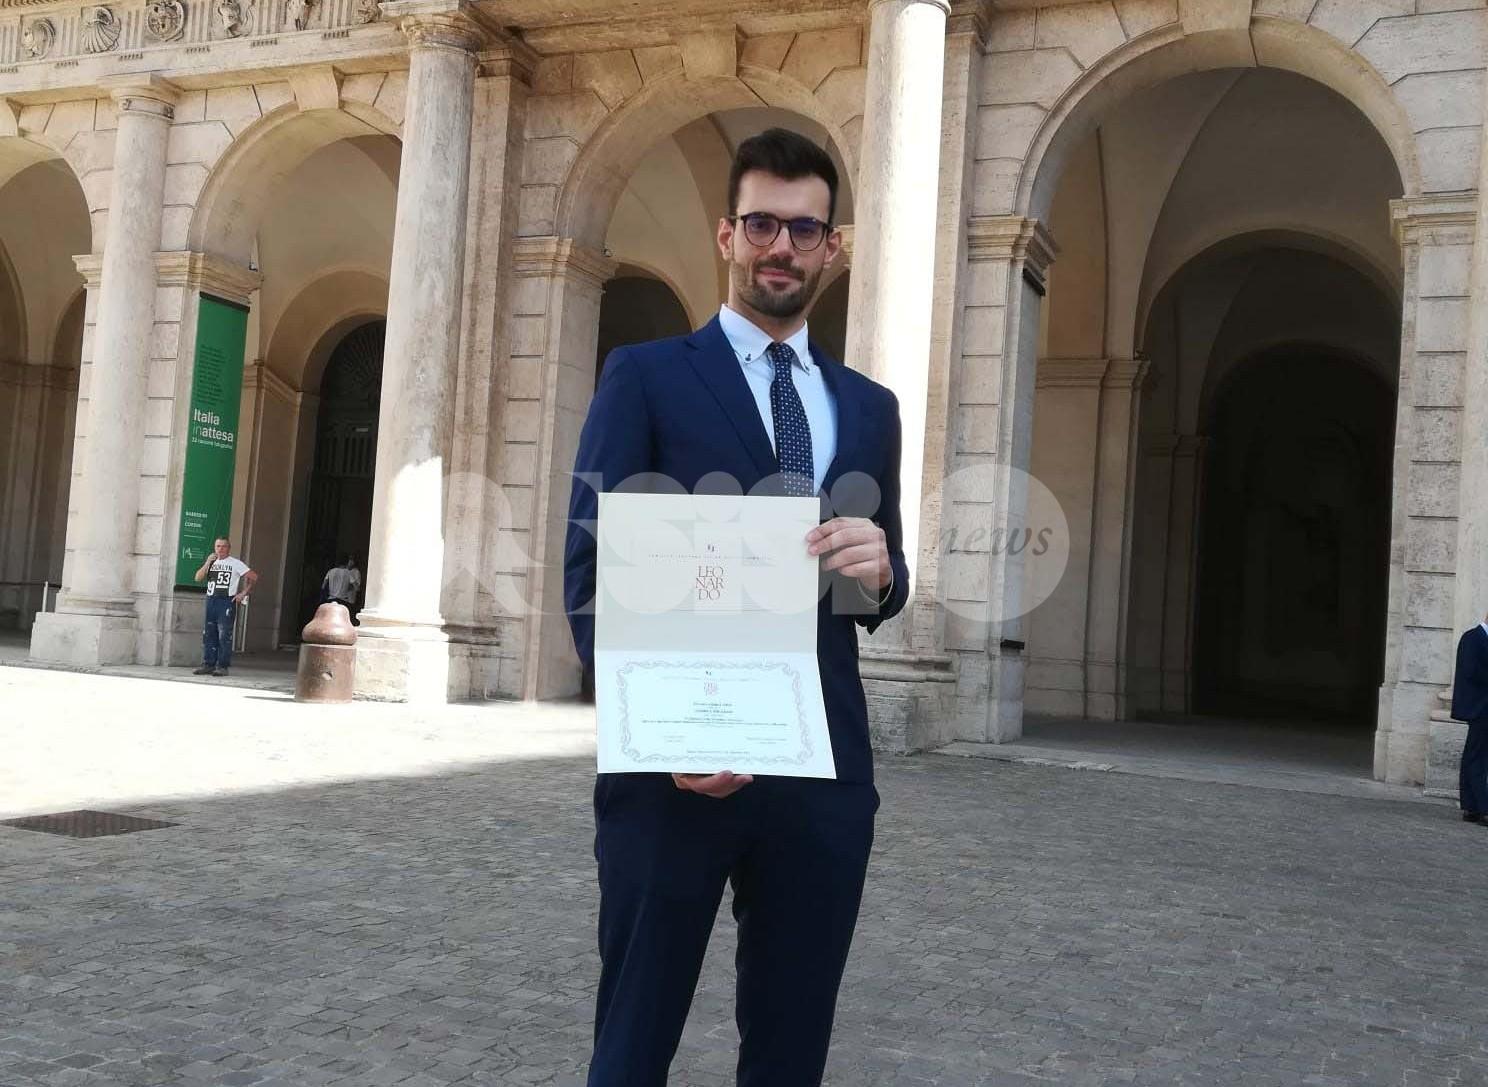 Premi Leonardo 2021, fra i vincitori Andrea Migliosi, assisano laureato in Ingegneria edile architettura